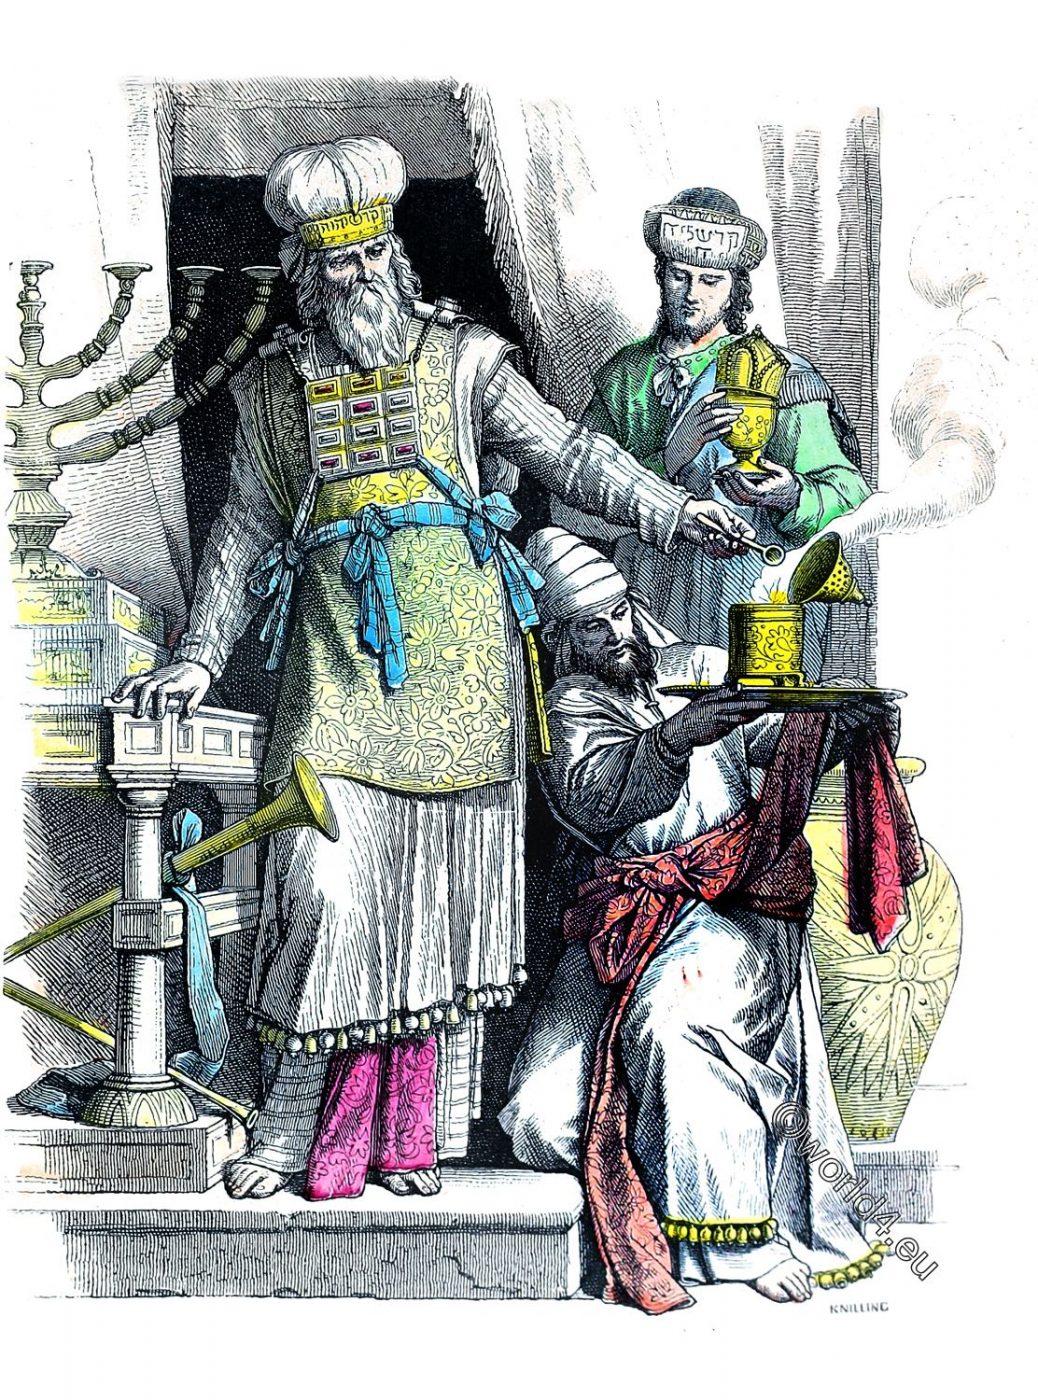 Jewish, high priest, Levites, costumes, dresses, antiquity